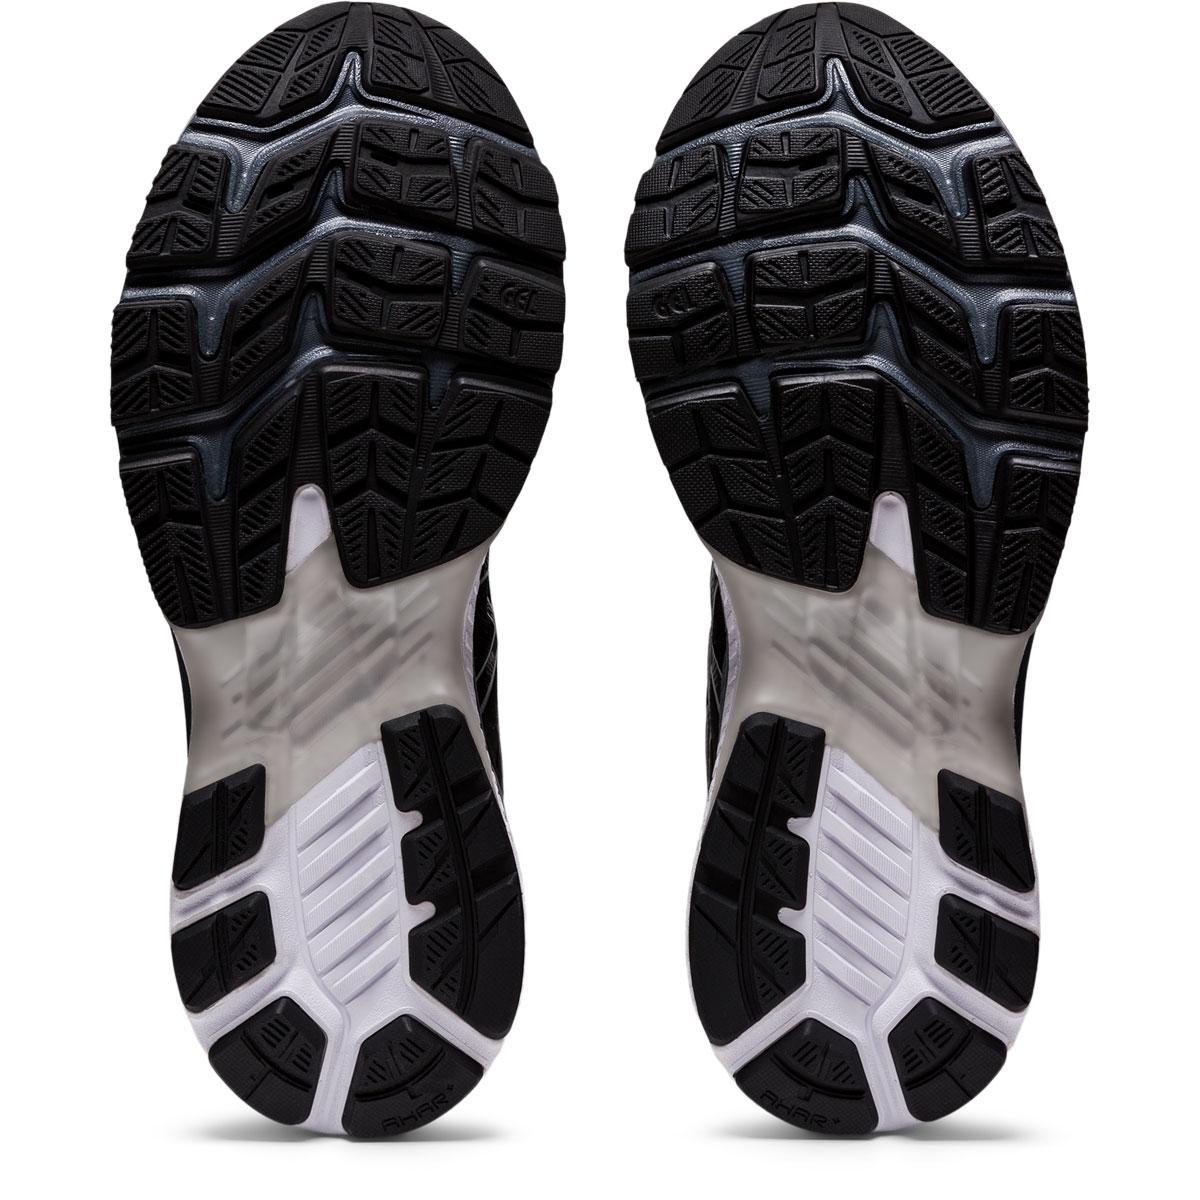 Men's Asics GEL-Kayano 27 Running Shoe - Color: Black/Pure Silv (Regular Width) - Size: 6, Black/Pure Silver, large, image 7